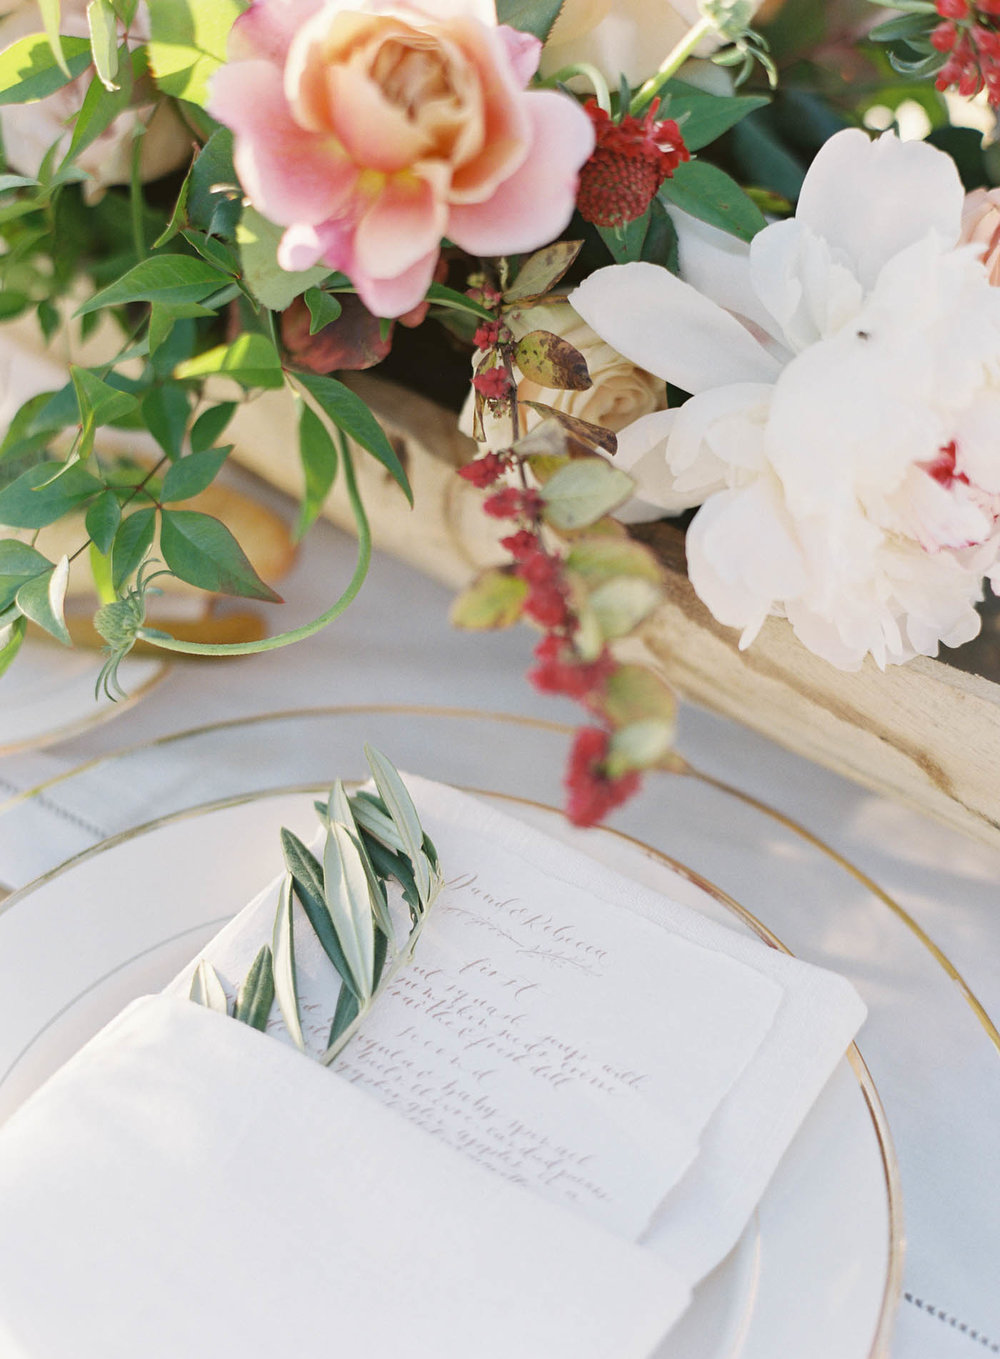 sunstone-villa-wedding-31-Jen_Huang-RD-176-Jen_Huang-009590-R1-011.jpg